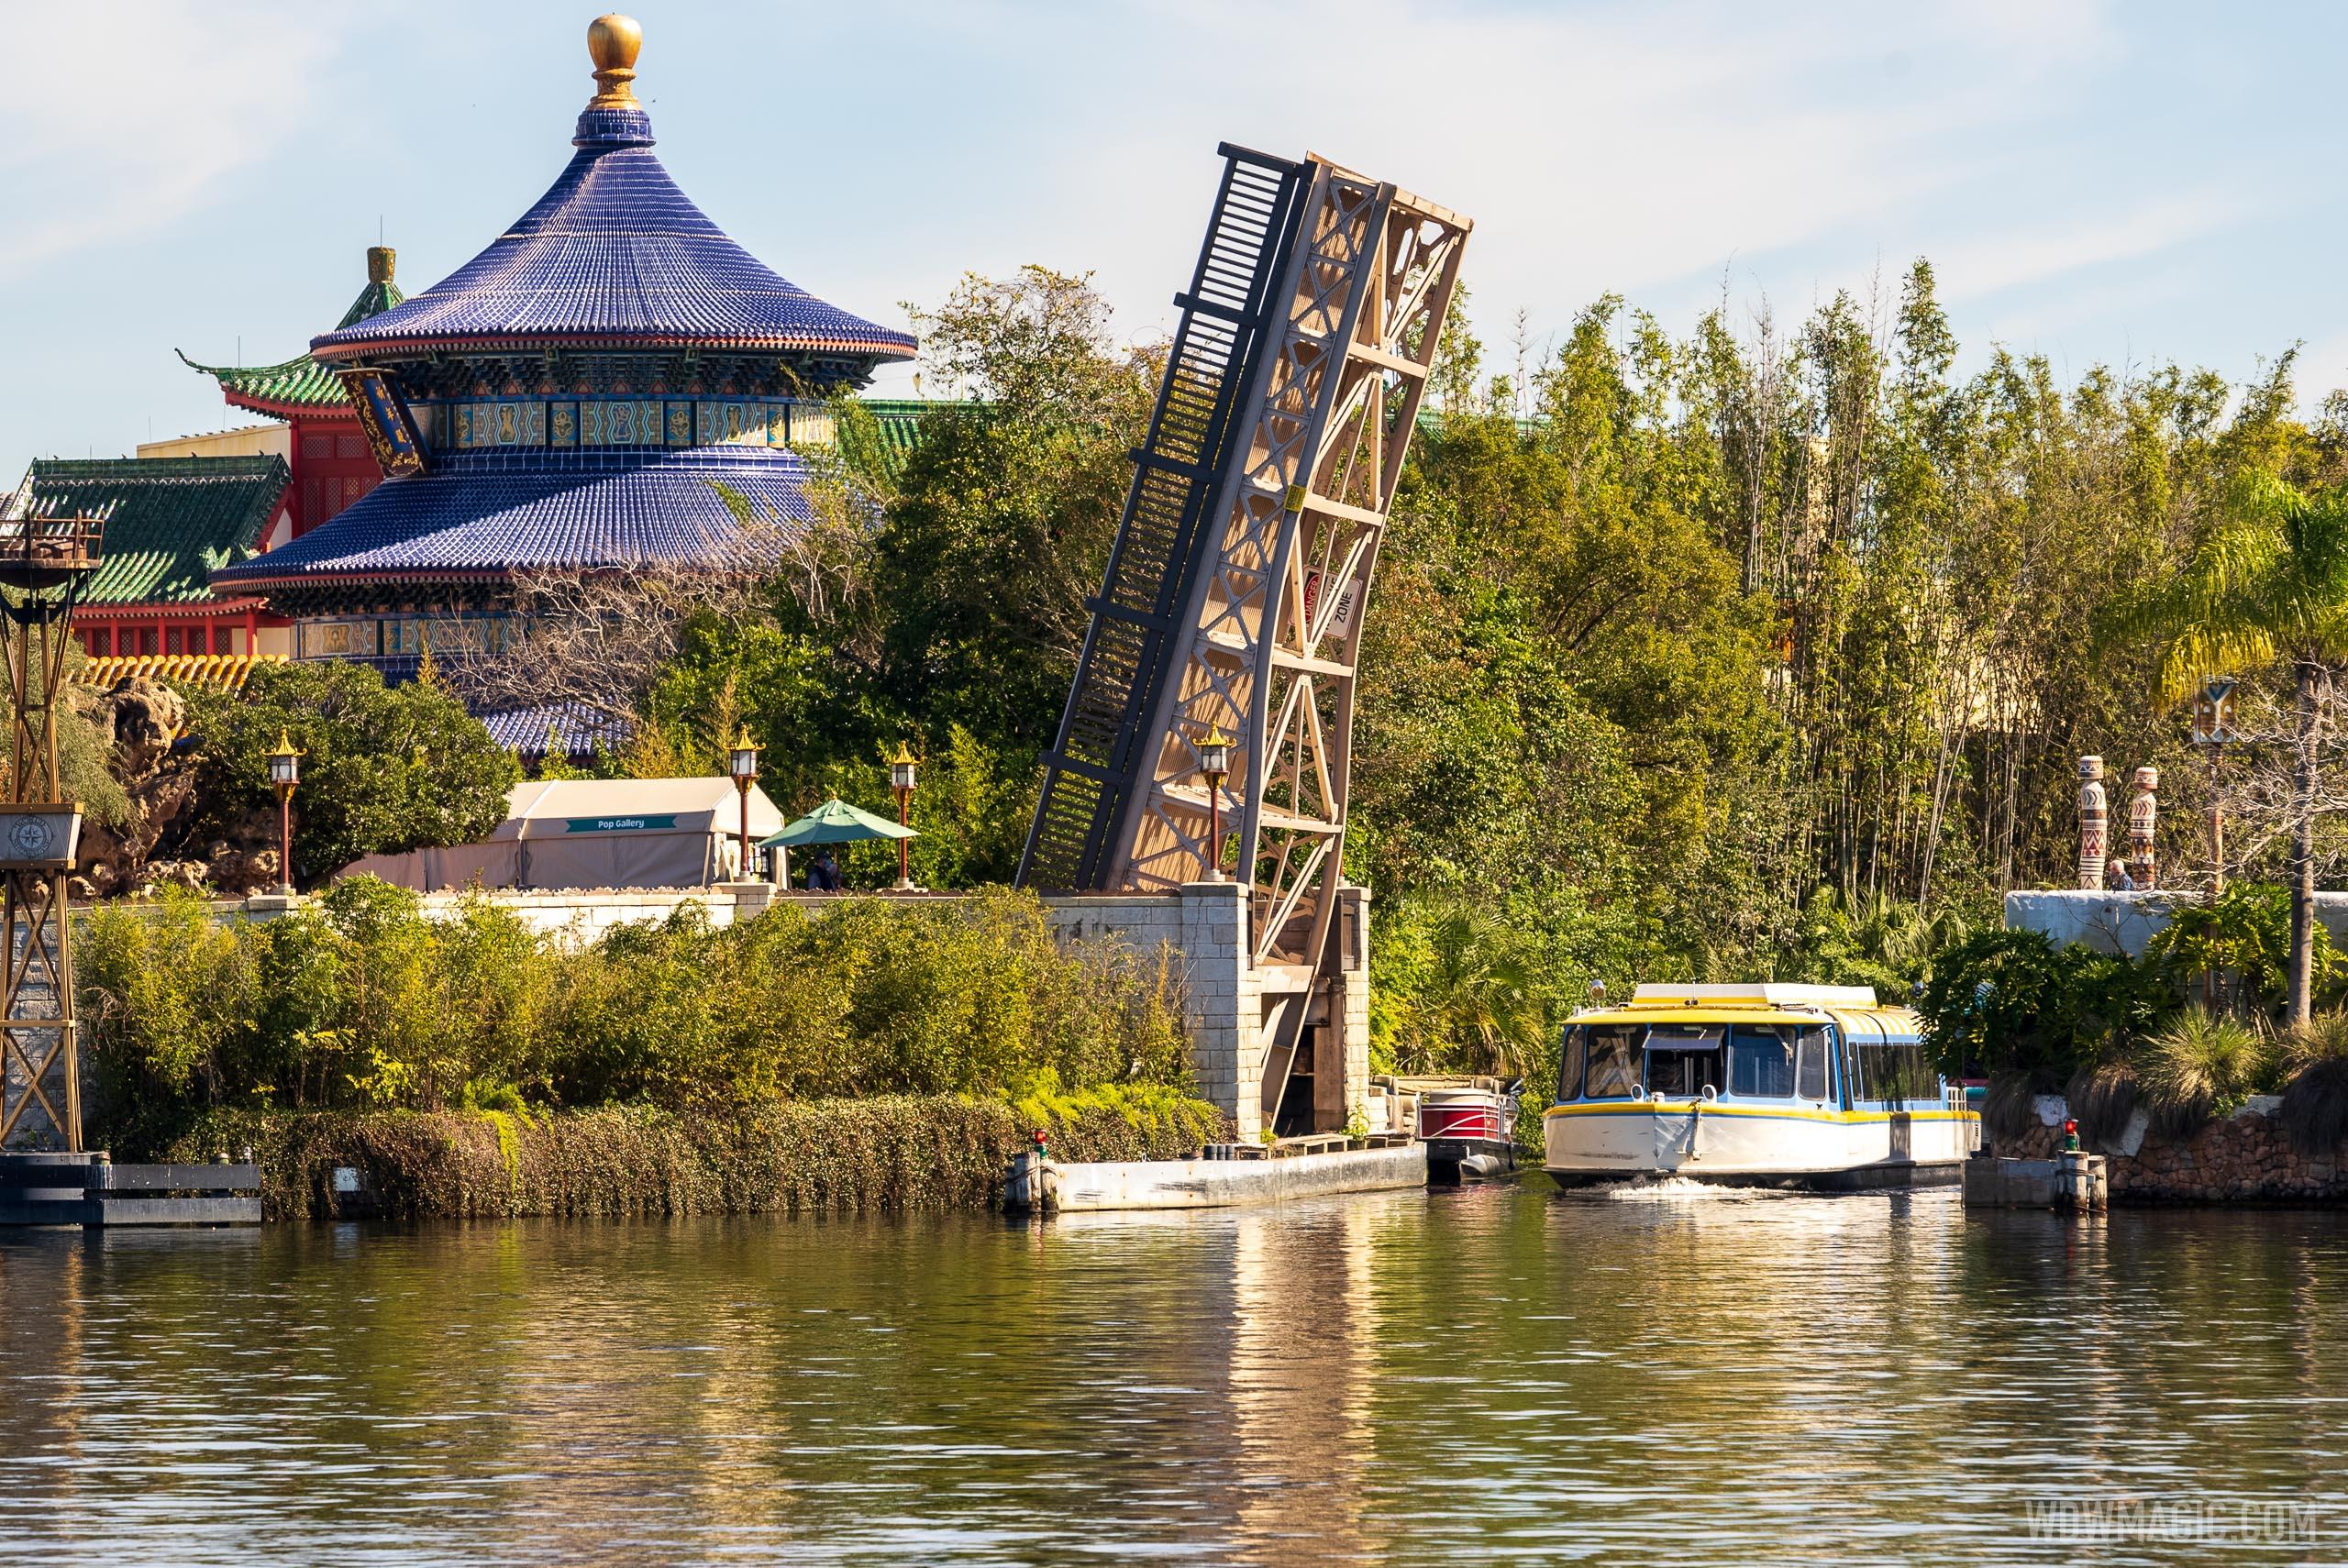 Friendship Boats passing through the promenade bridge onto World Showcase Lagoon